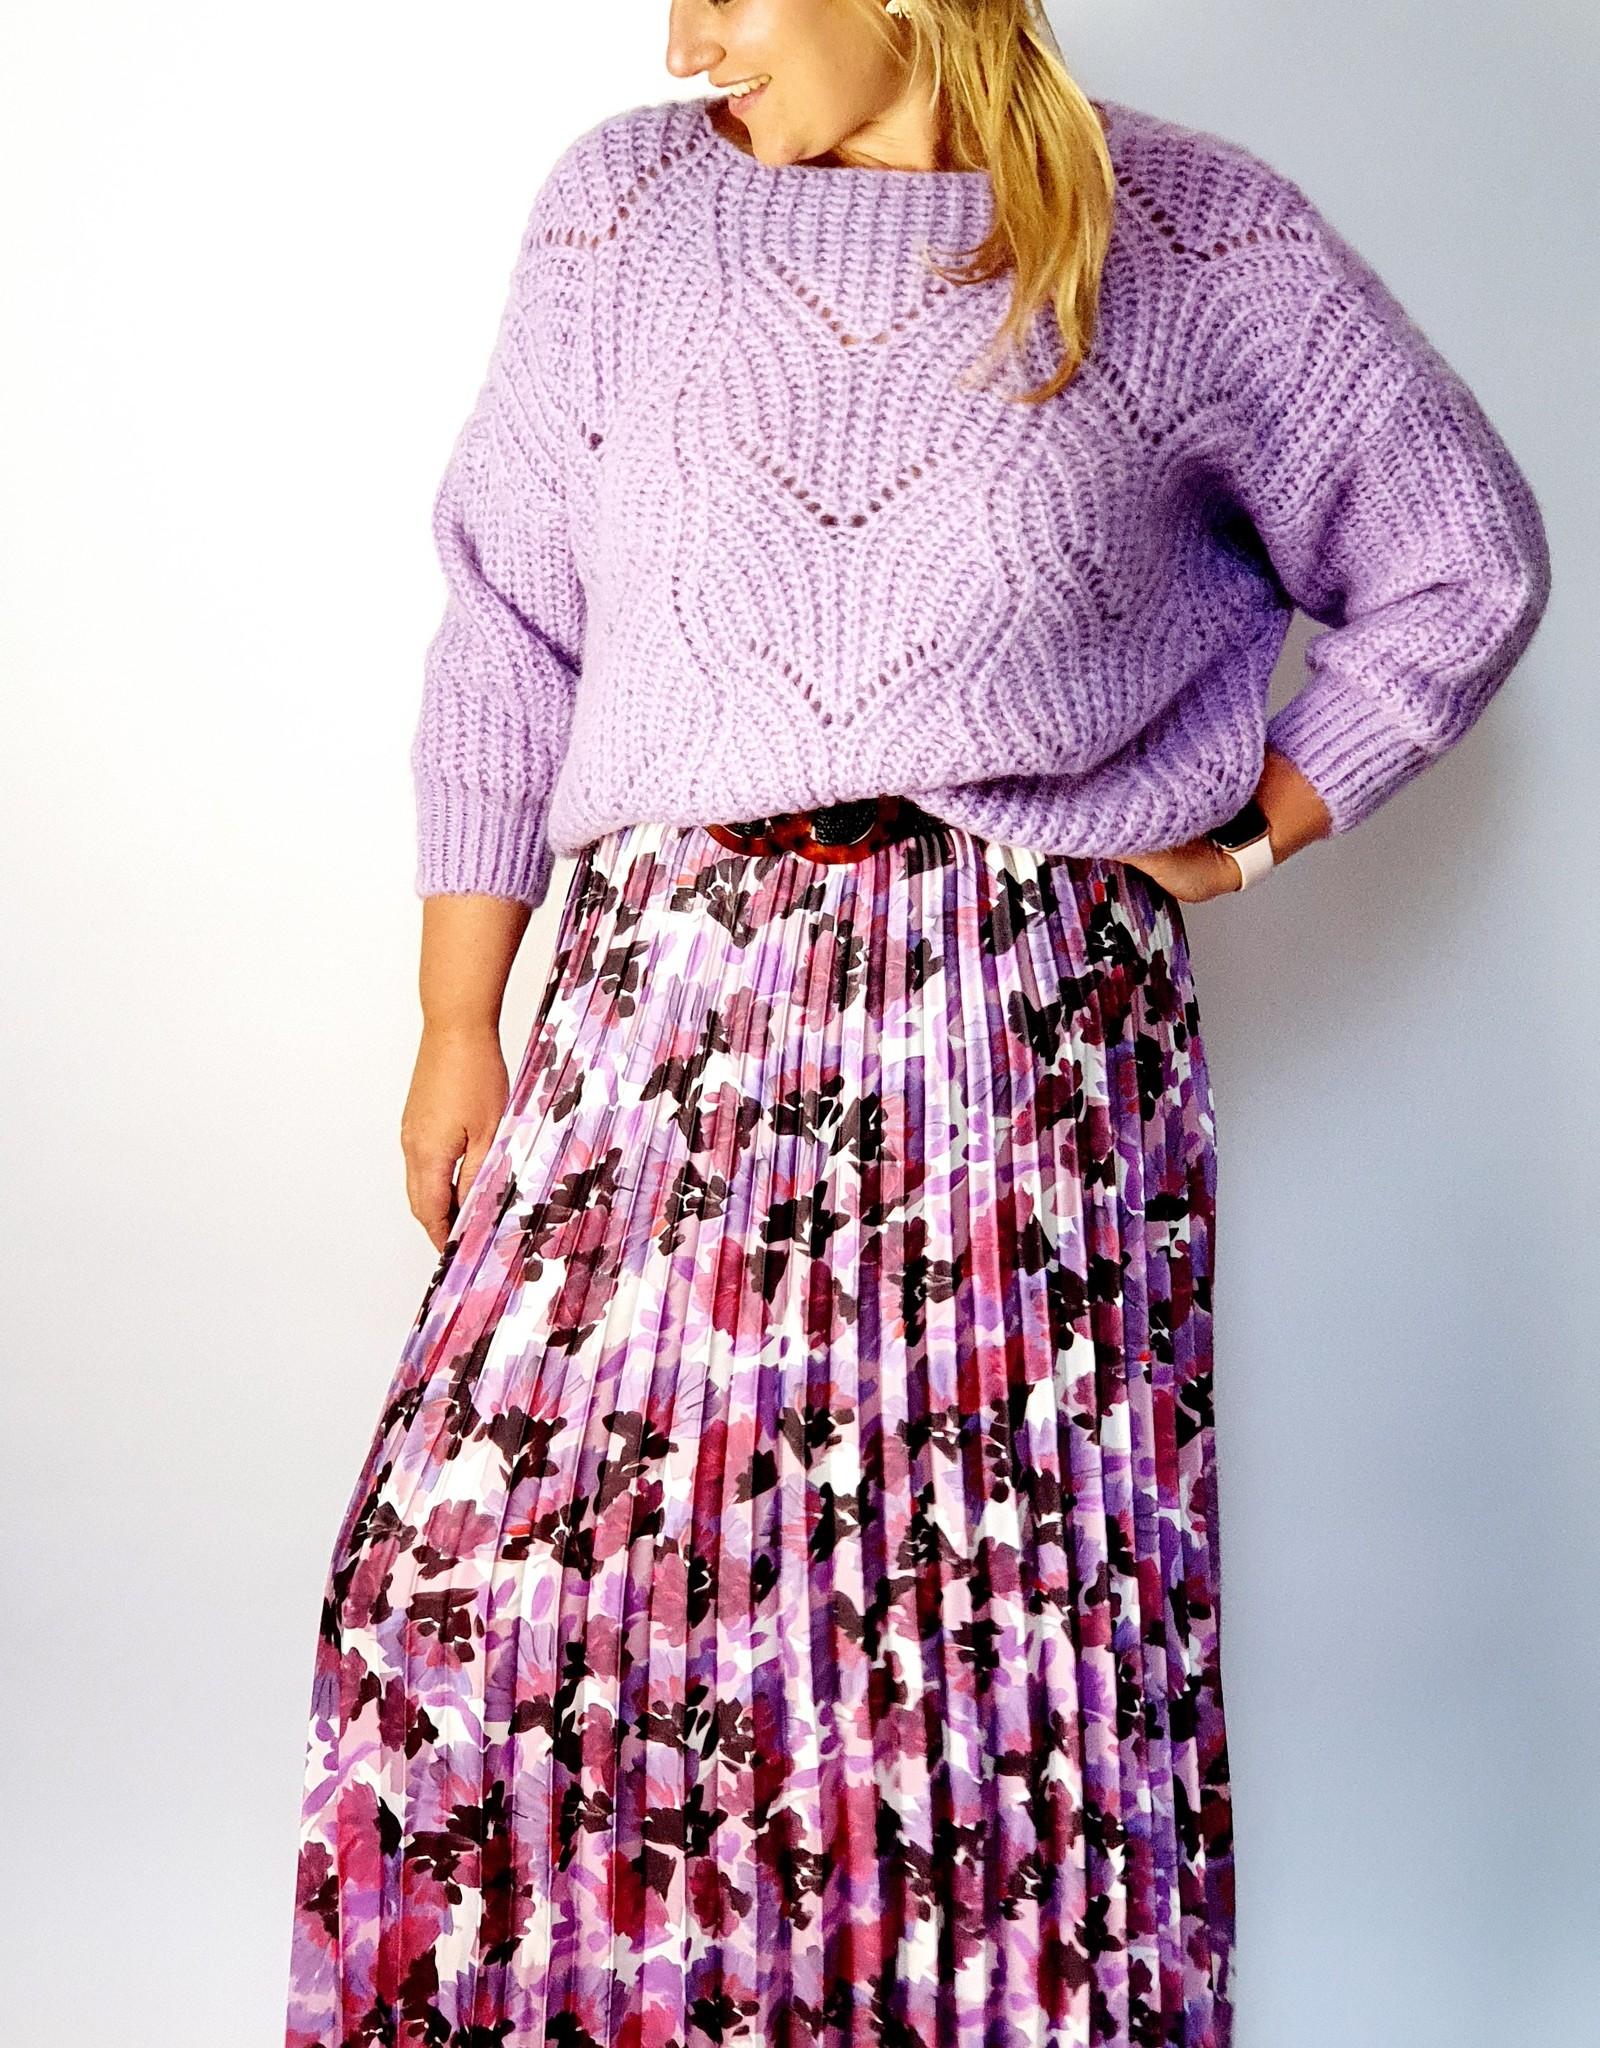 Lilac flower skirt